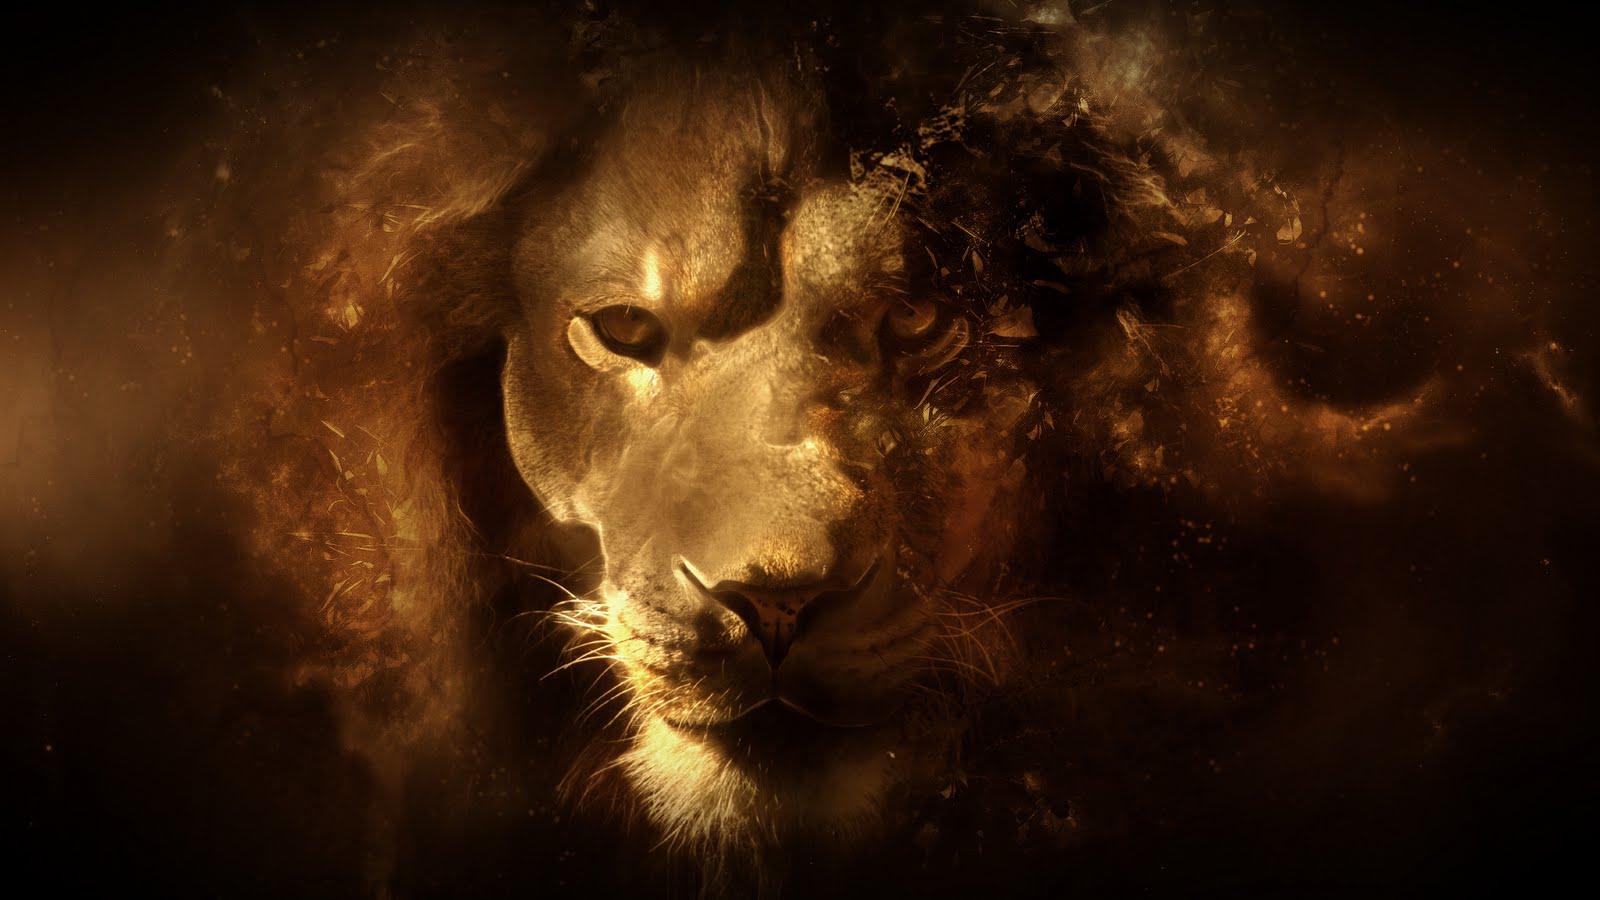 43 Lion 1080p Wallpaper On Wallpapersafari